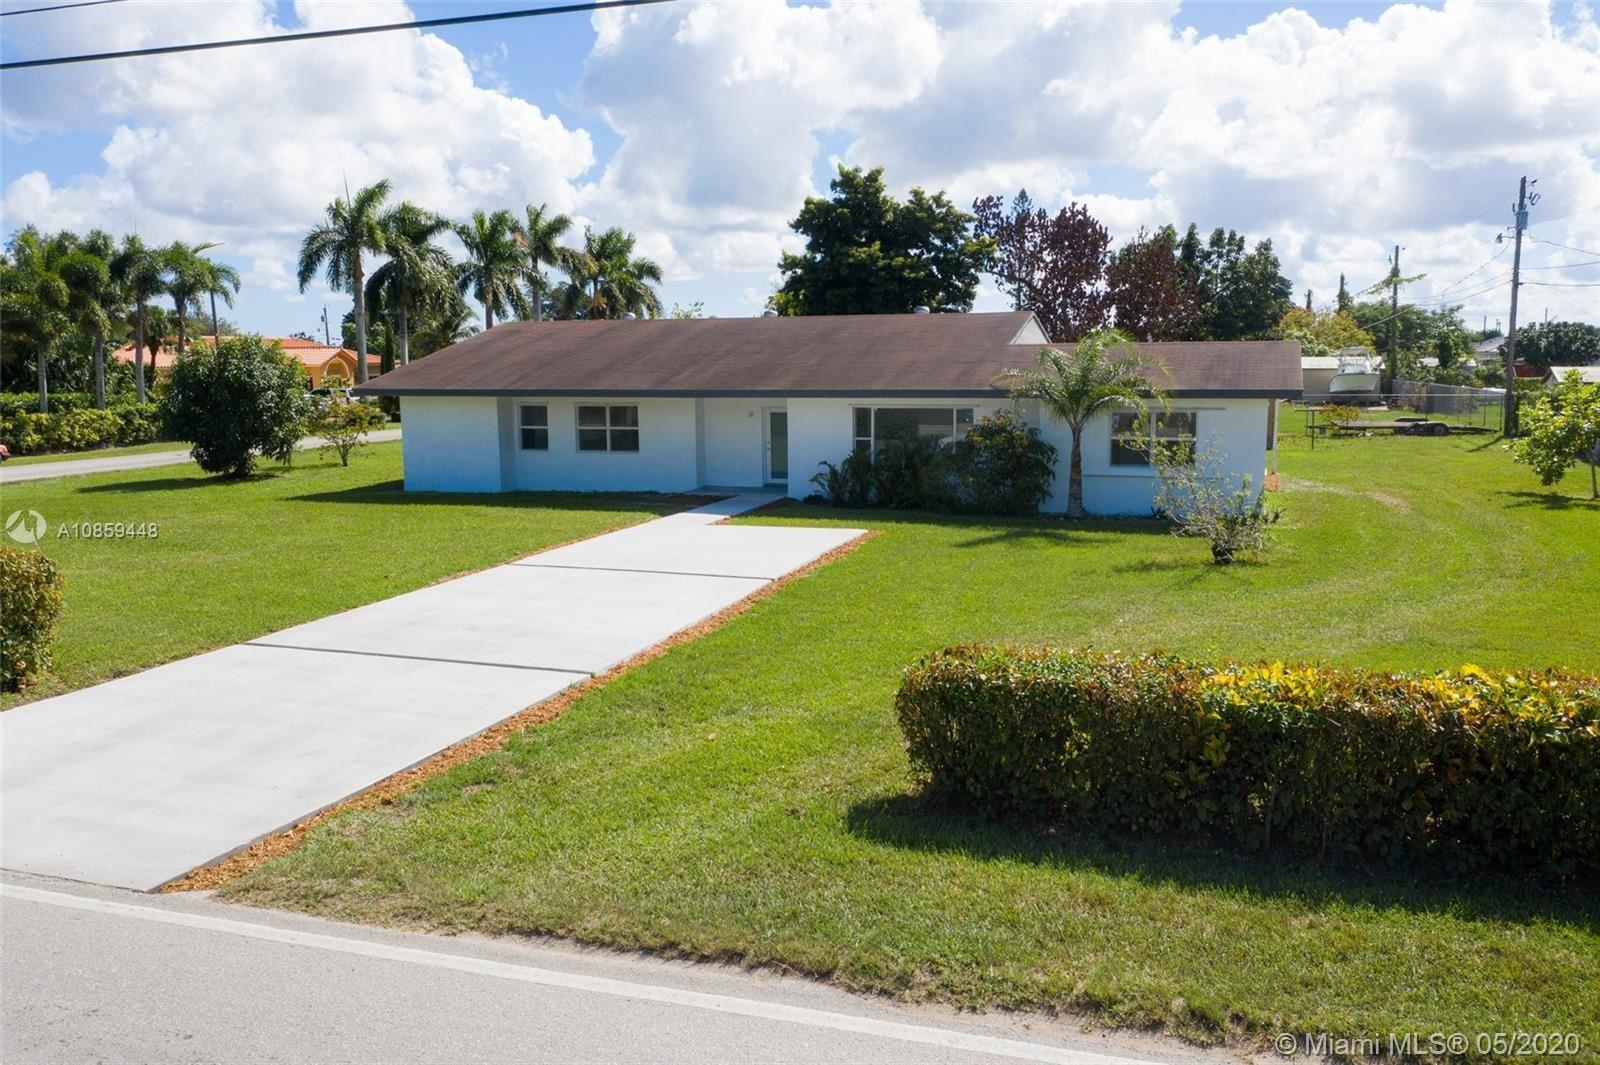 19600 SW 320th St, Homestead, FL 33030 - #: A10859448